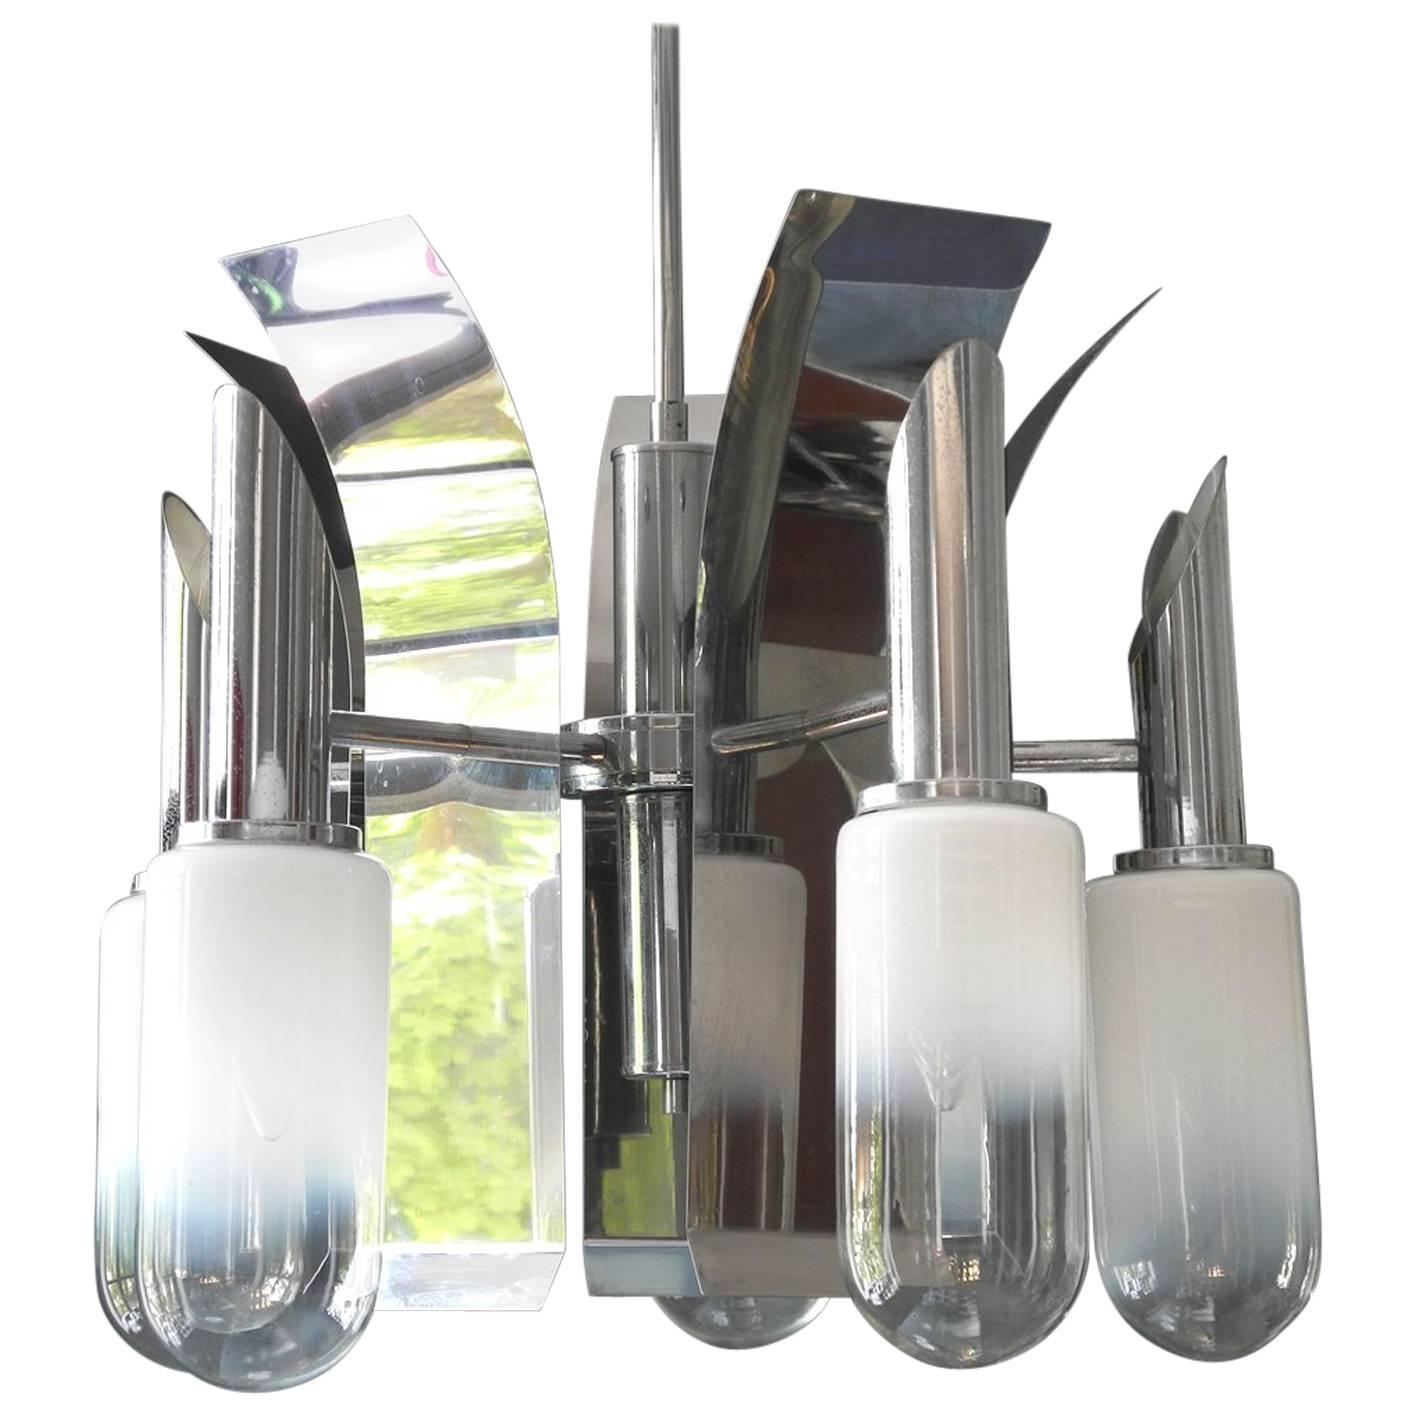 1960s Italian Mazzega Pop Art Space Age Chrome Ceiling Lamp with Glass Shades